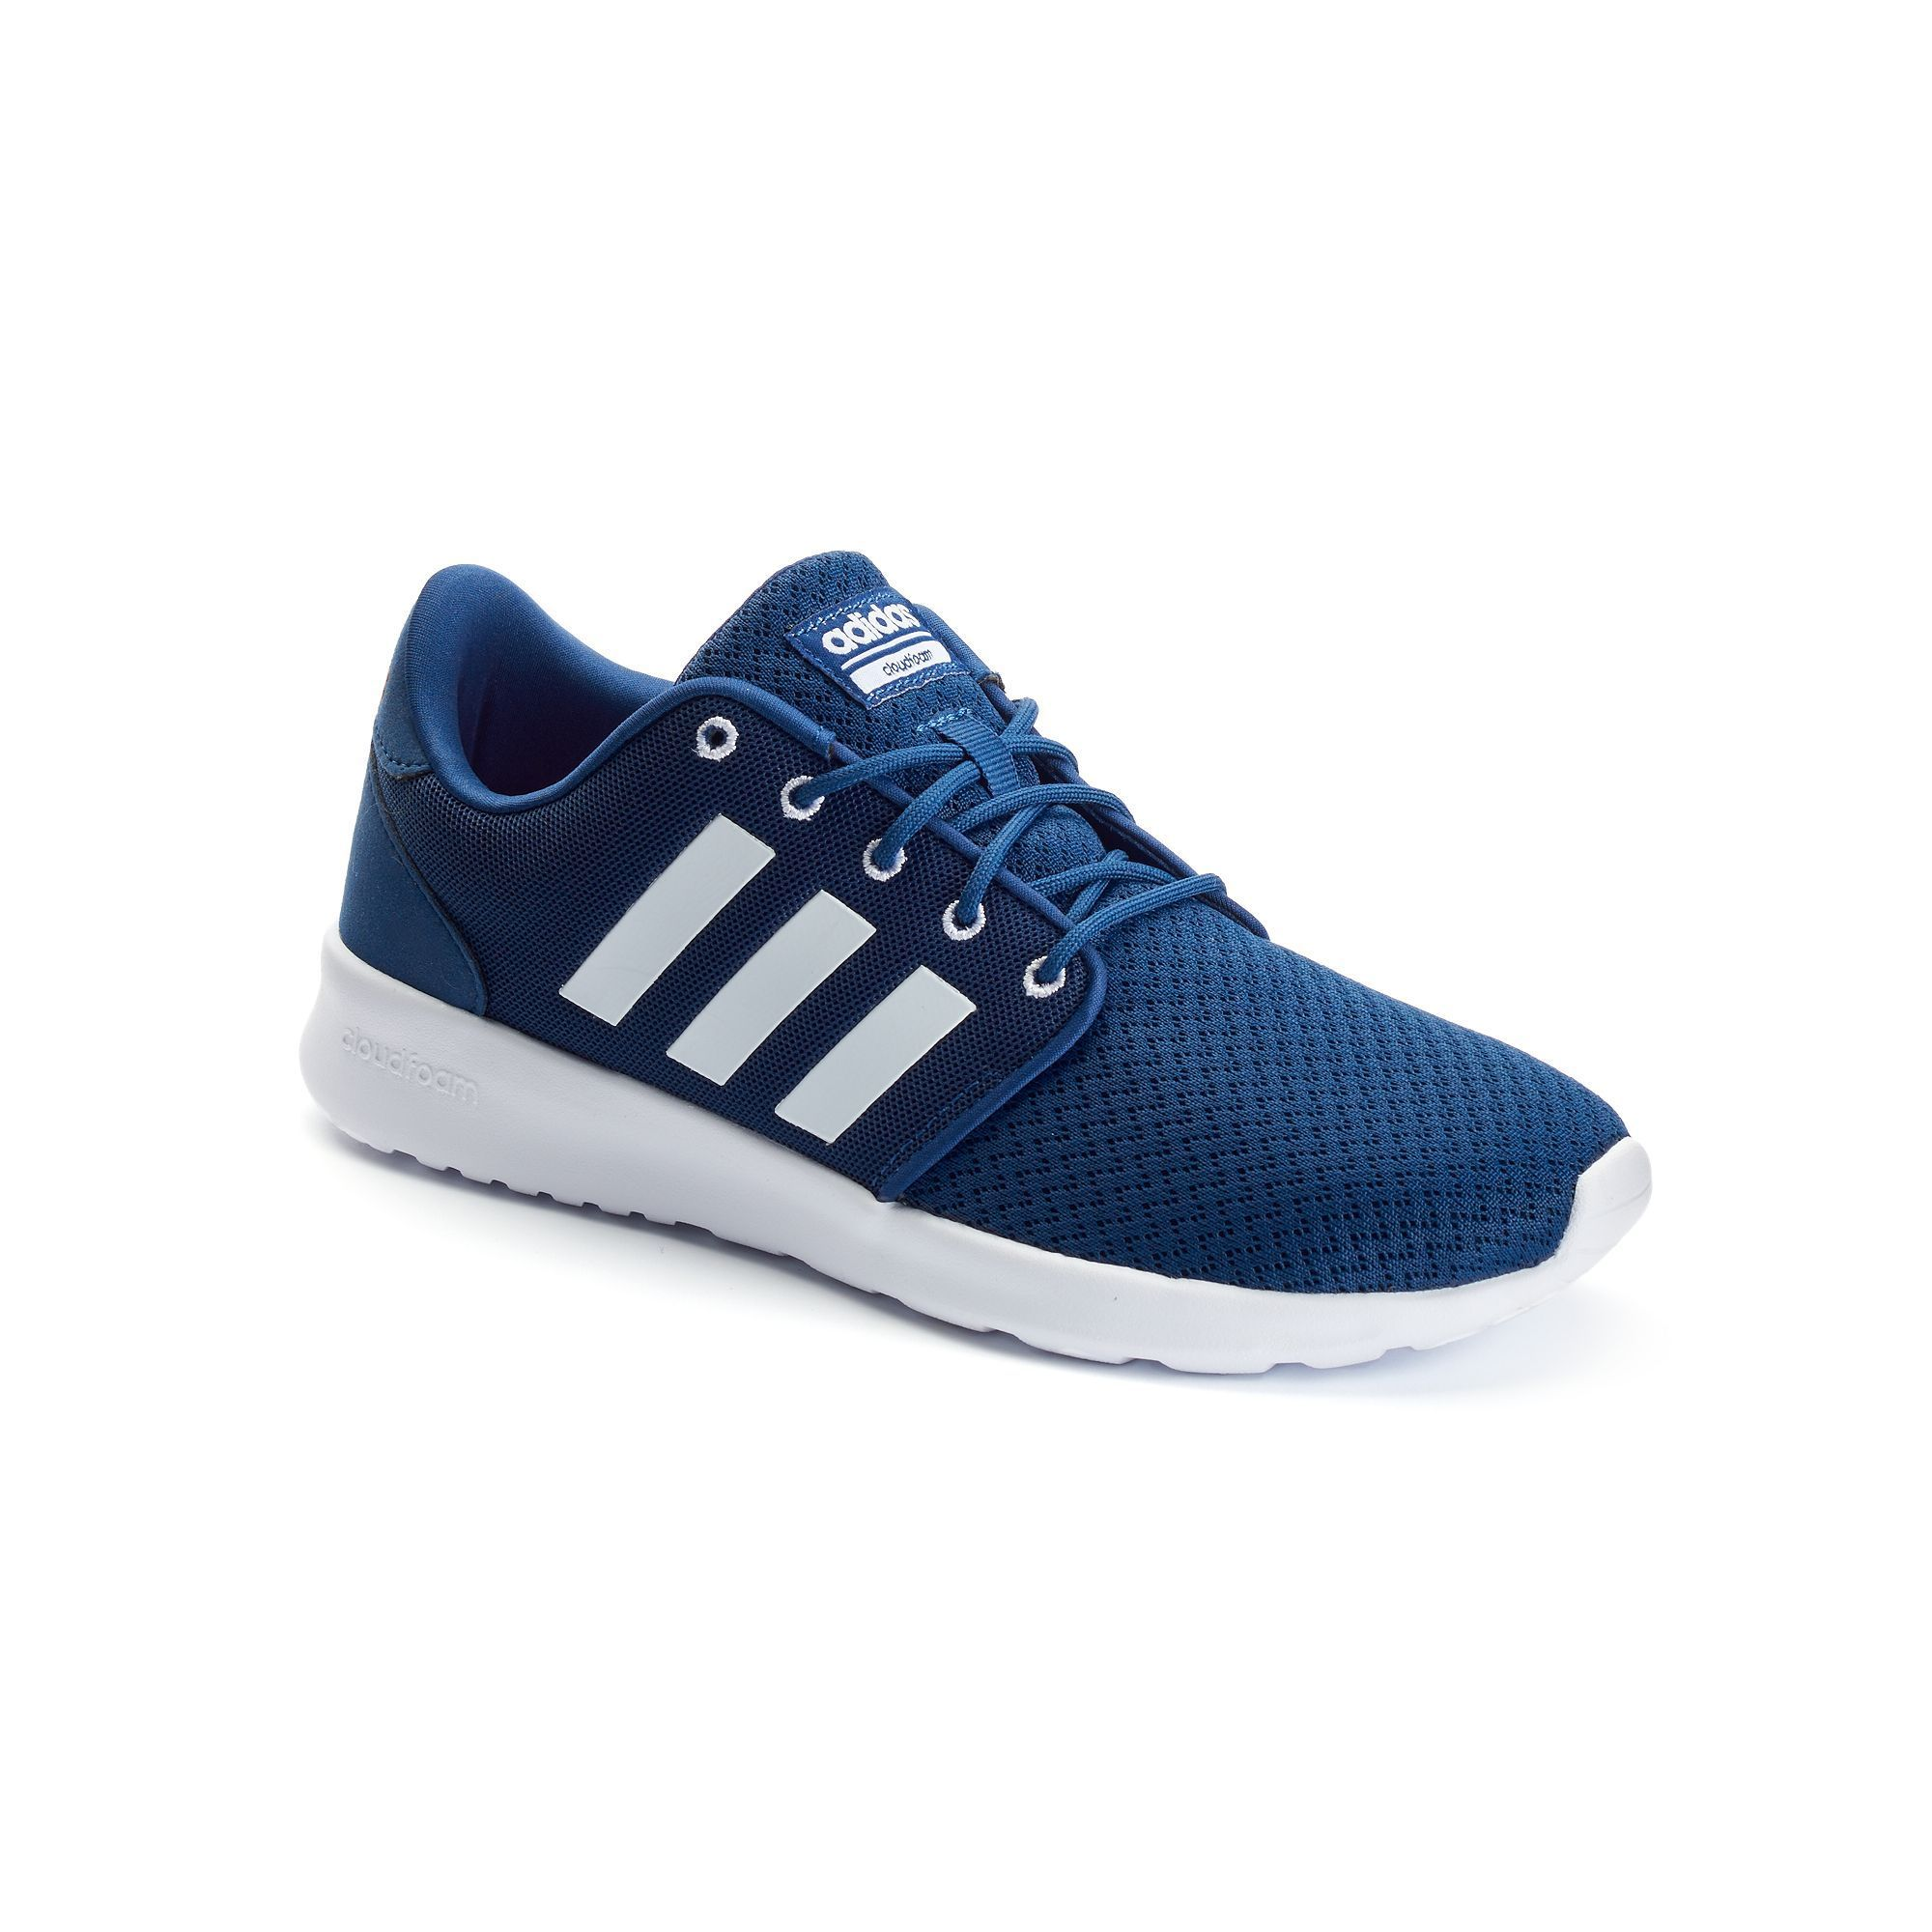 Adidas NEO Cloudfoam QT Racer Women\u0027s Shoes, Size: 10, Black